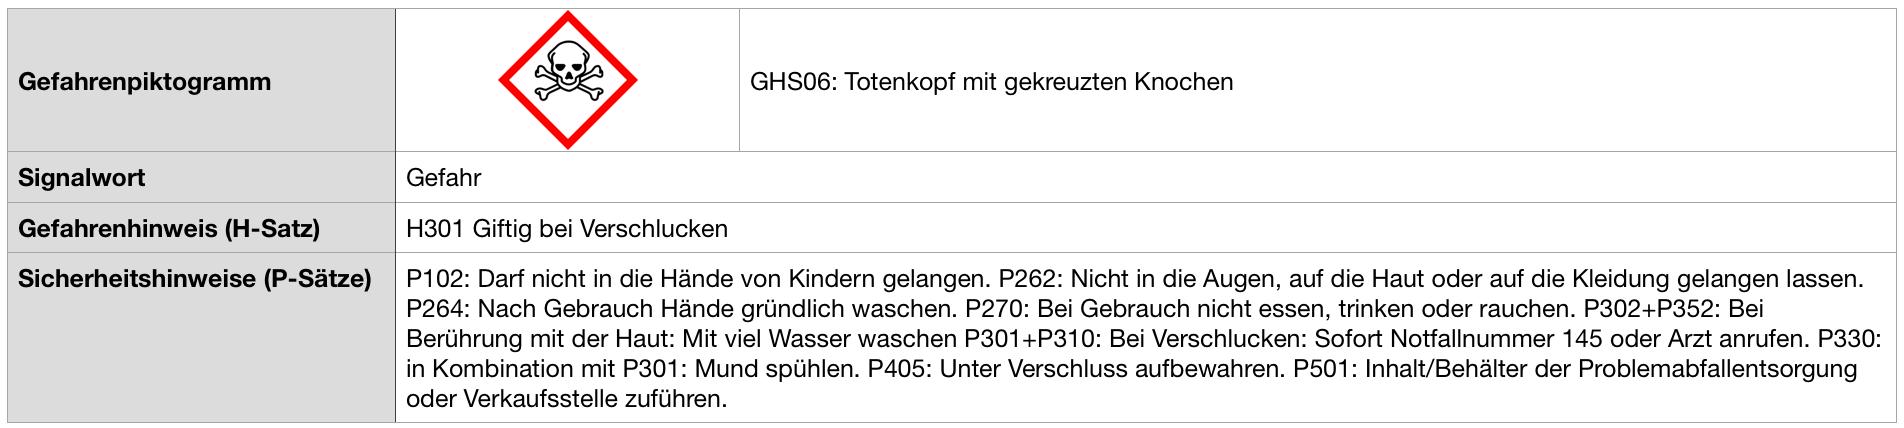 GHF_Gefahr_301_405